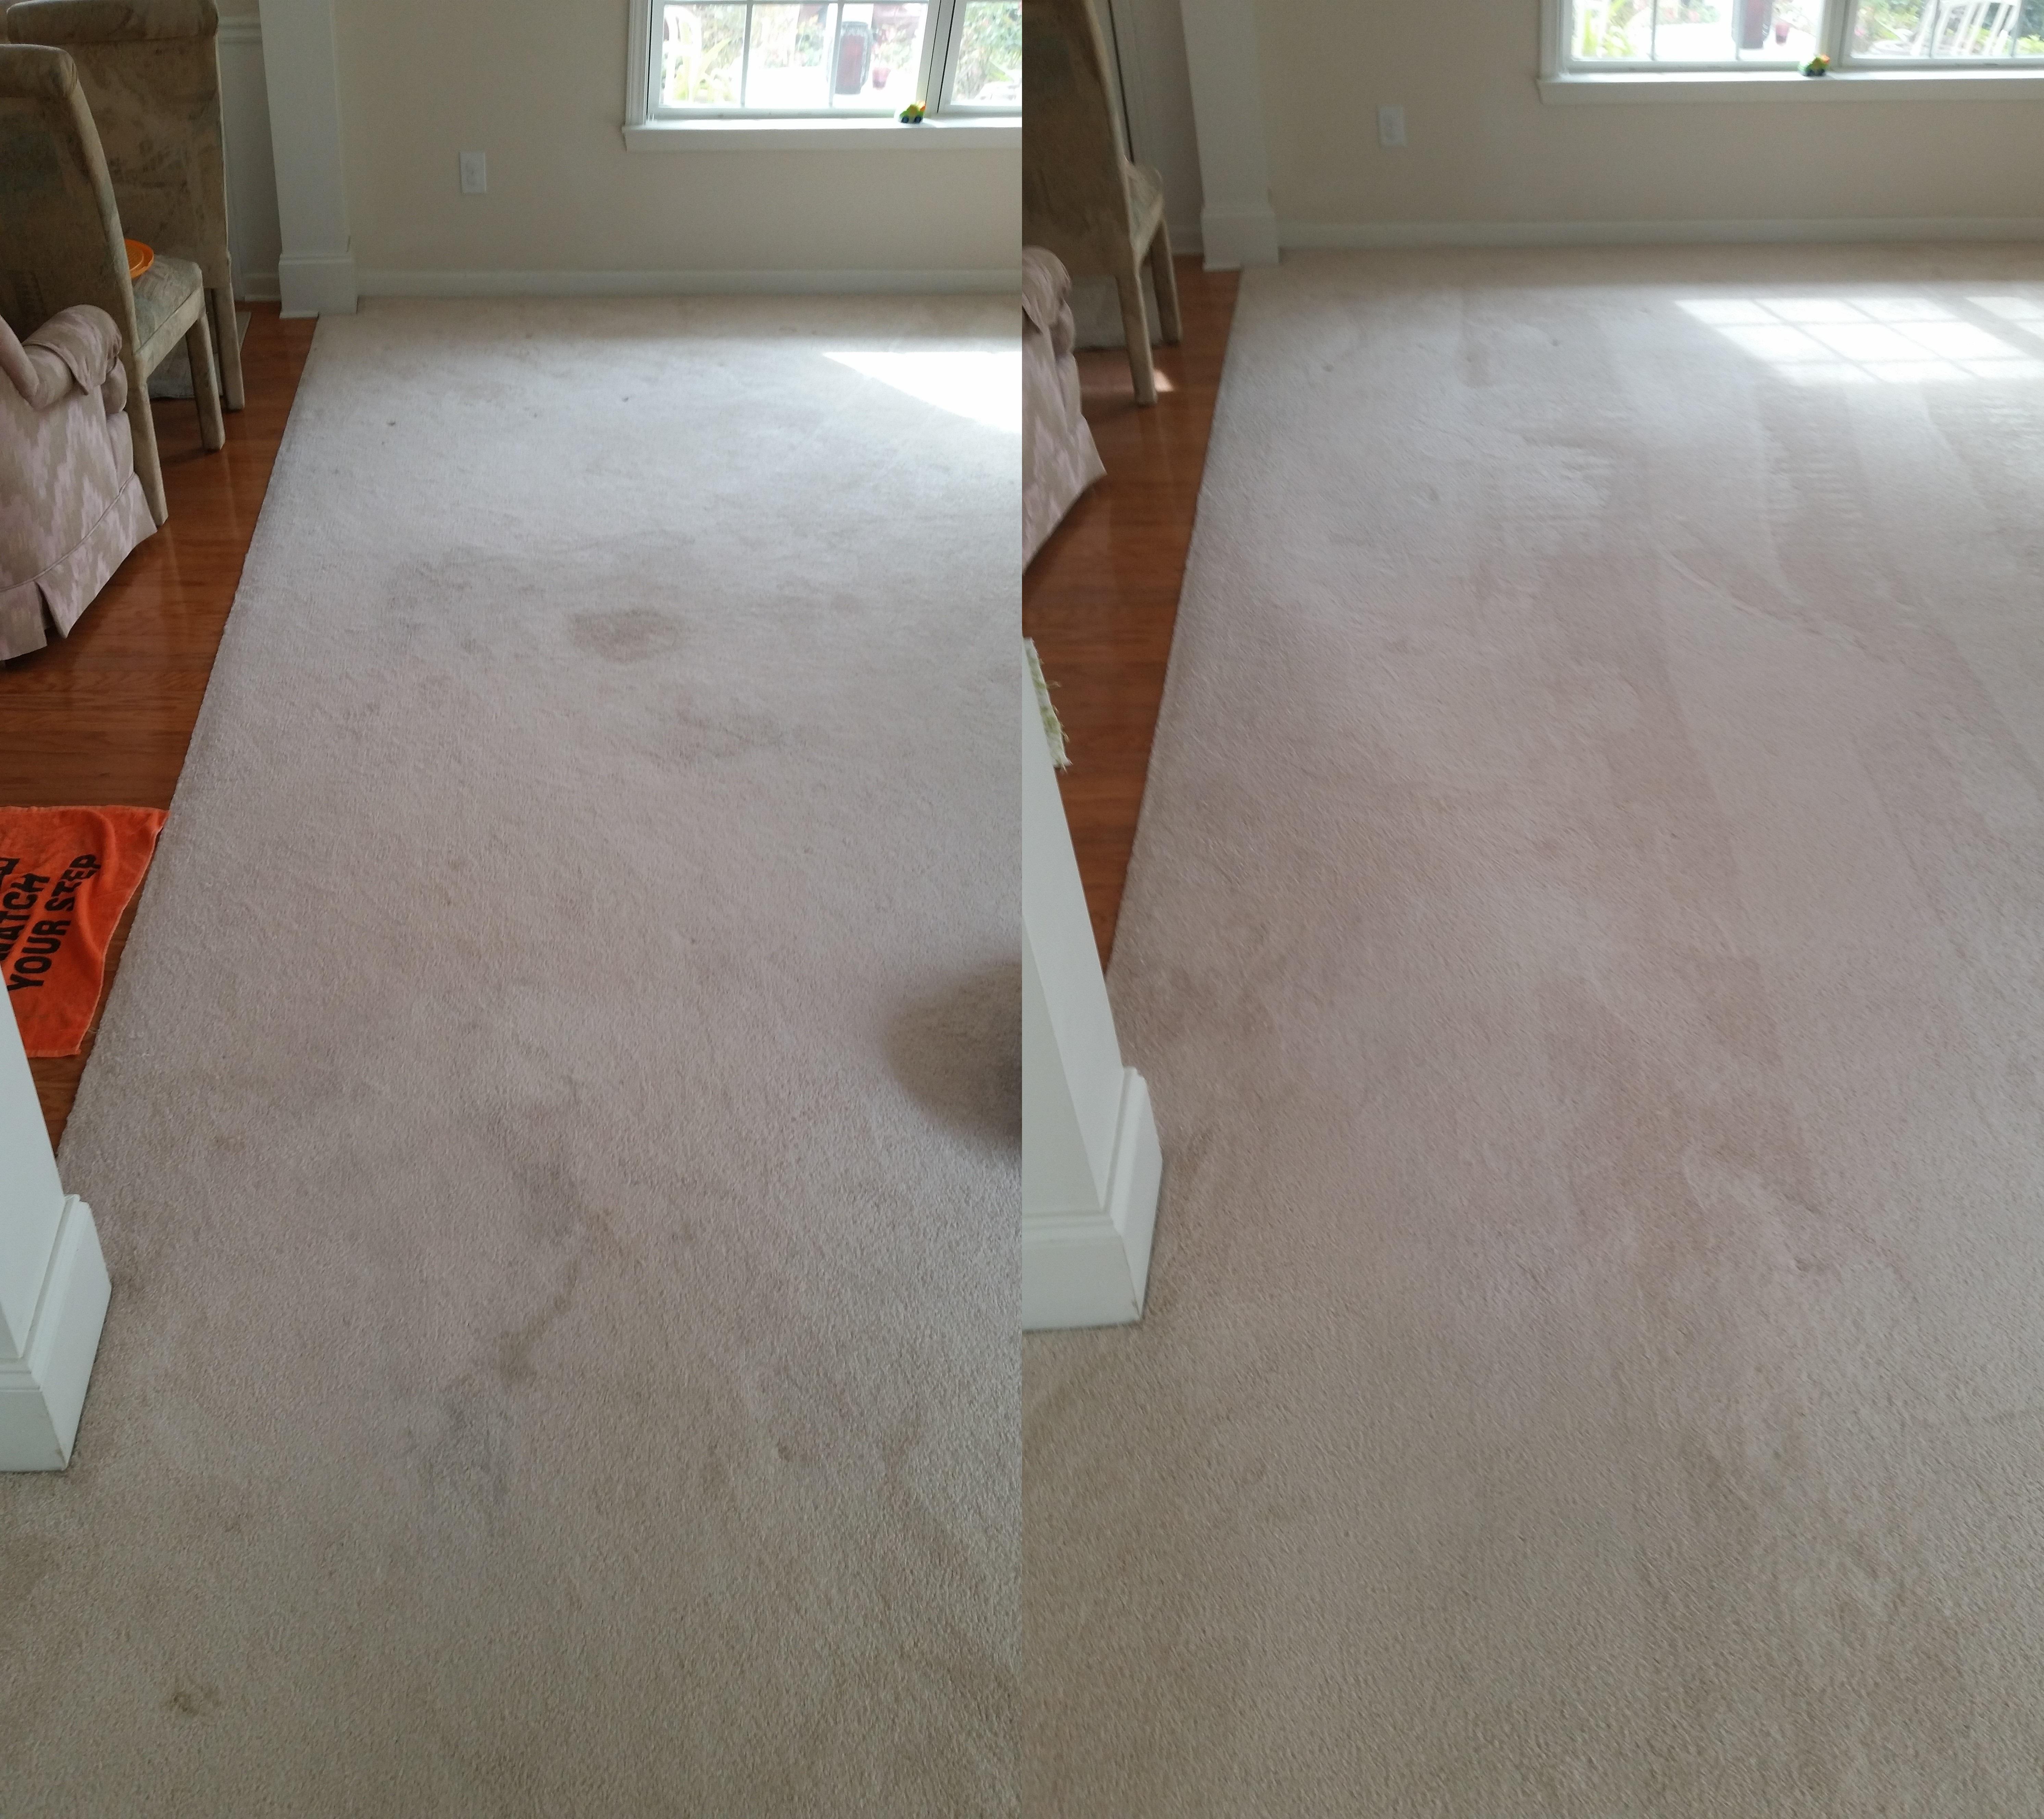 11-10-14-b-a-citrusolution-carpet-cleaning-suwanee-15